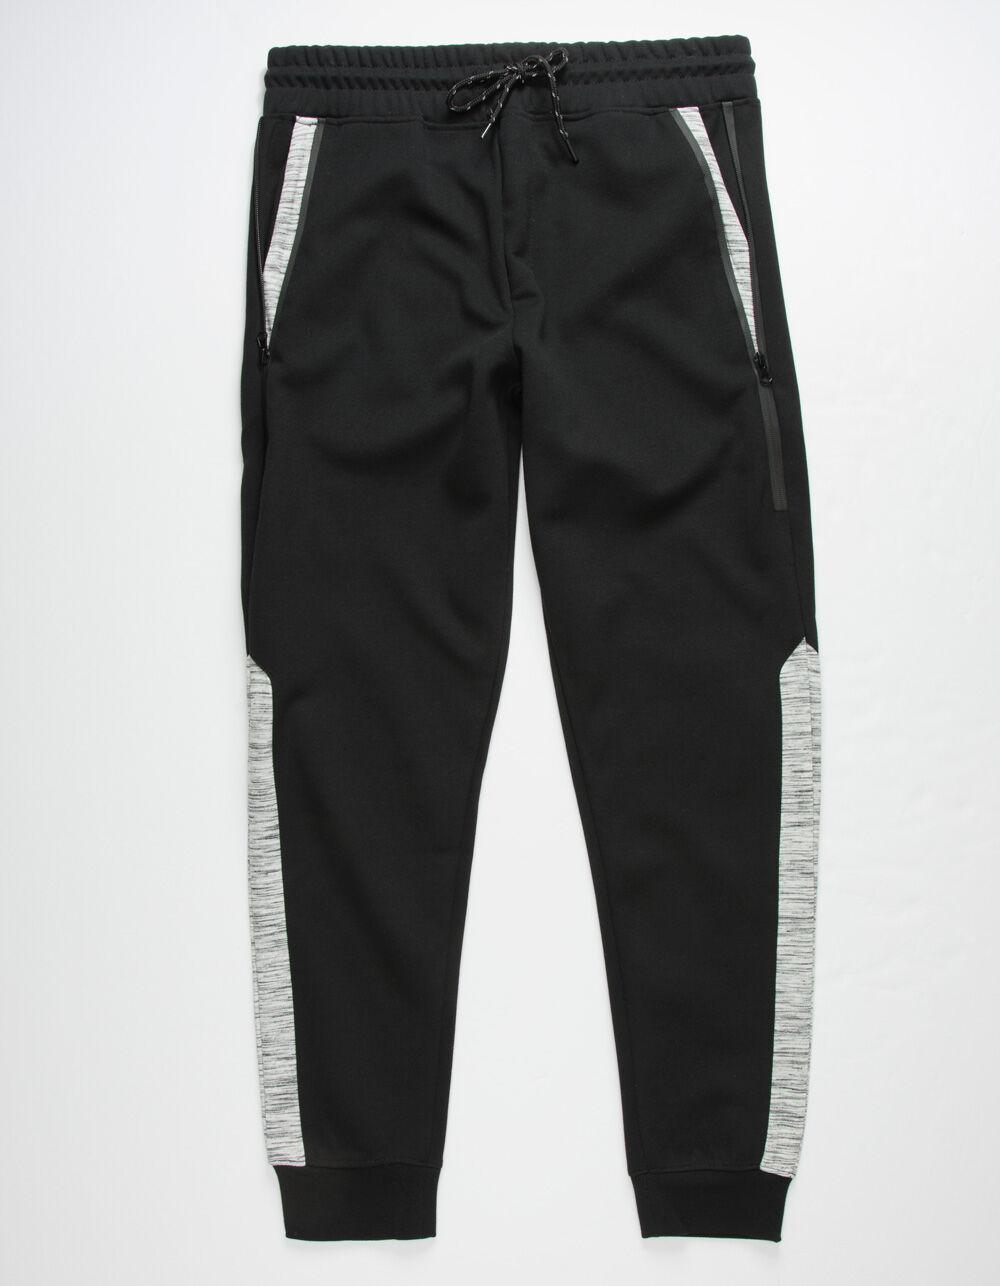 Image of BROOKLYN CLOTH INTERTECH BLACK JOGGER PANTS